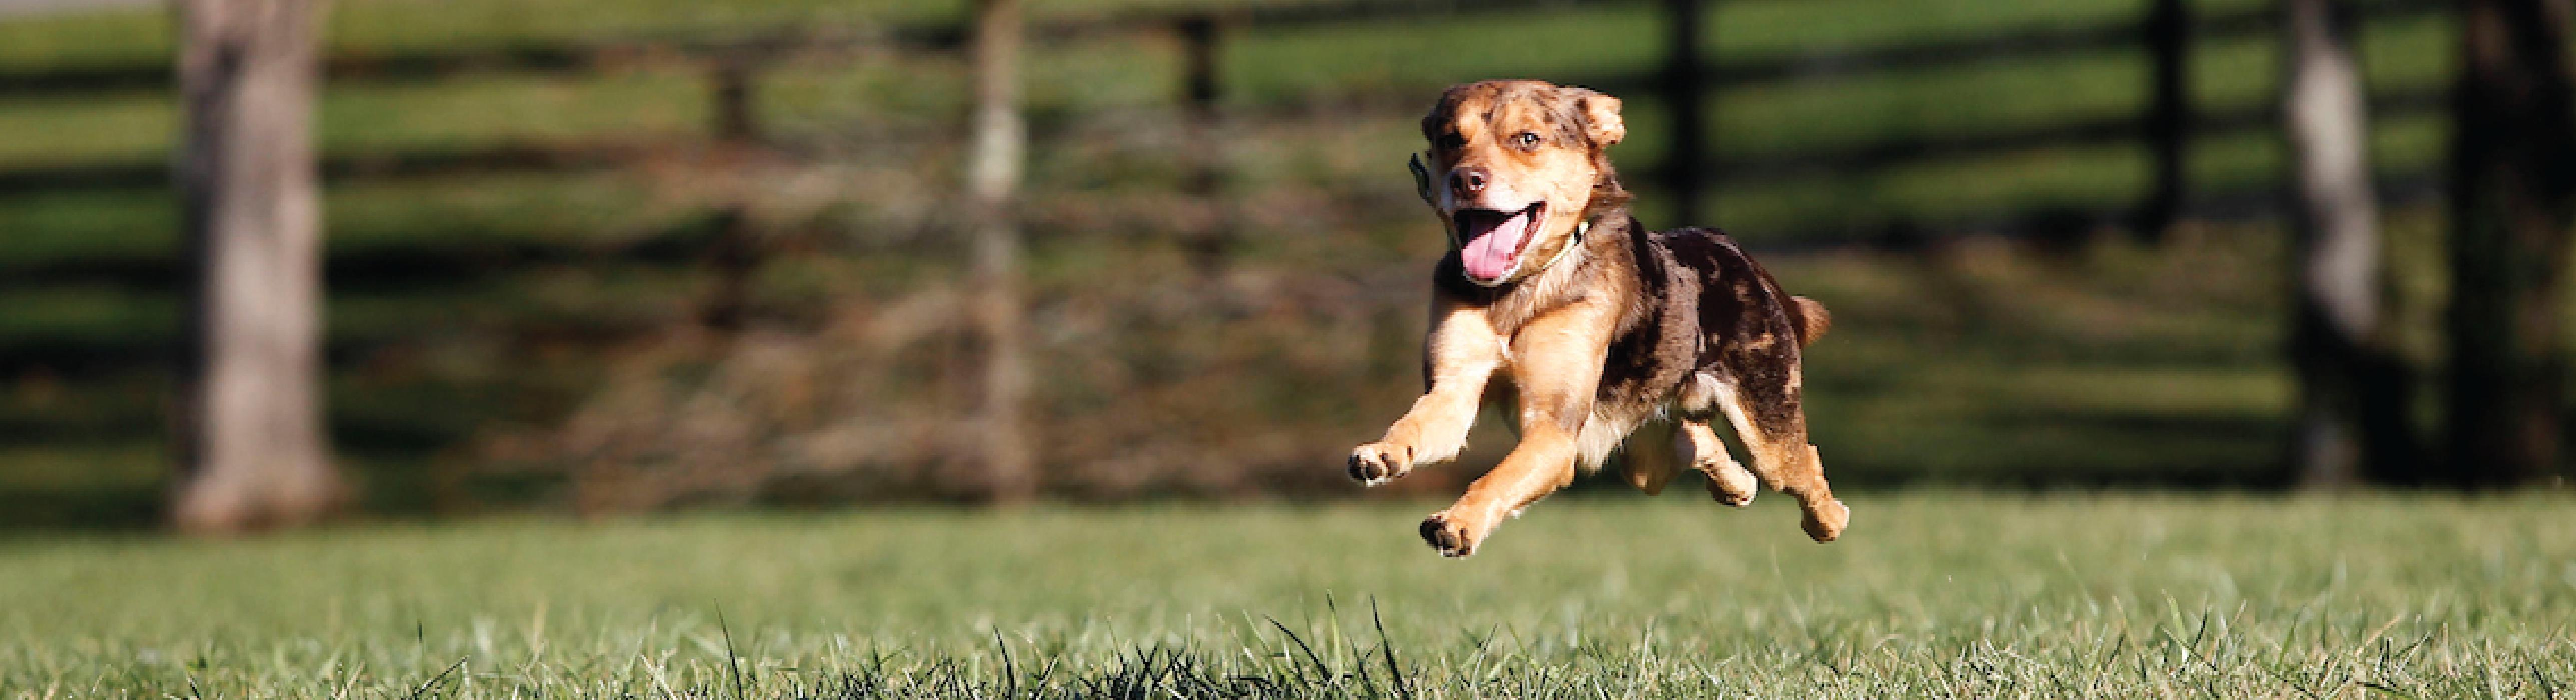 Lexington Dog Park Rules